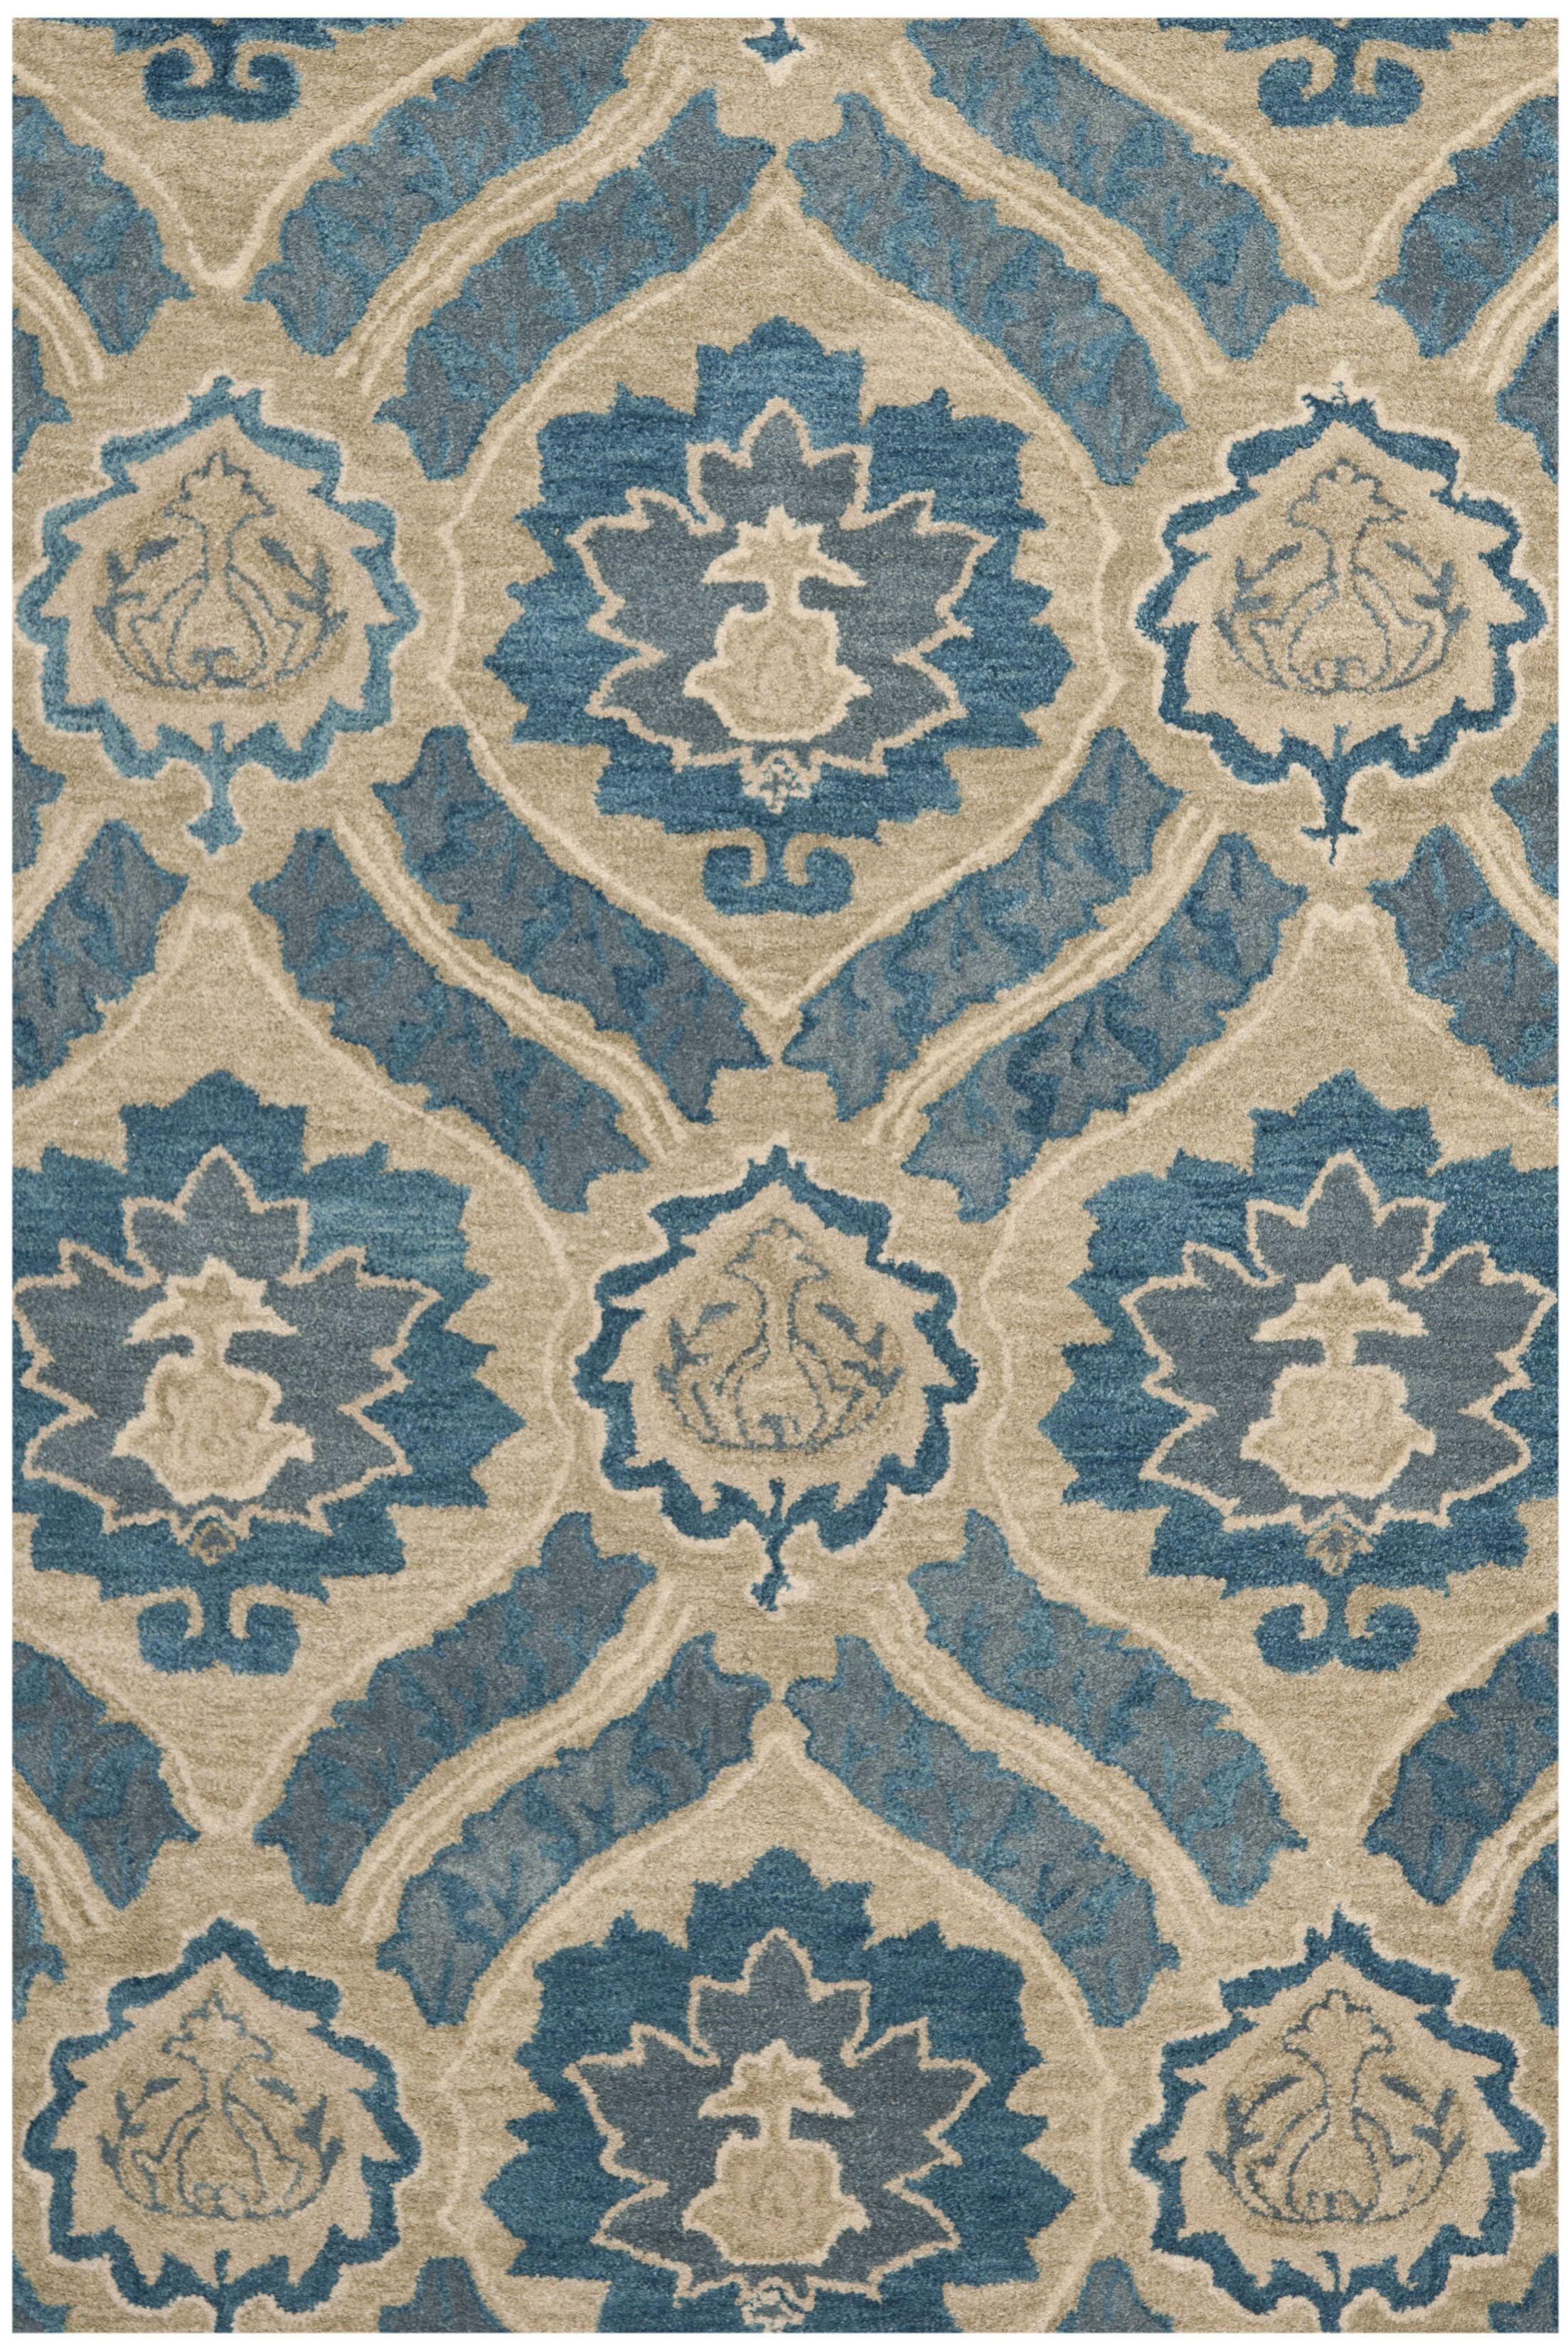 Matthews Blue/Ivory Area Rug Rug Size: Rectangle 10' x 14'